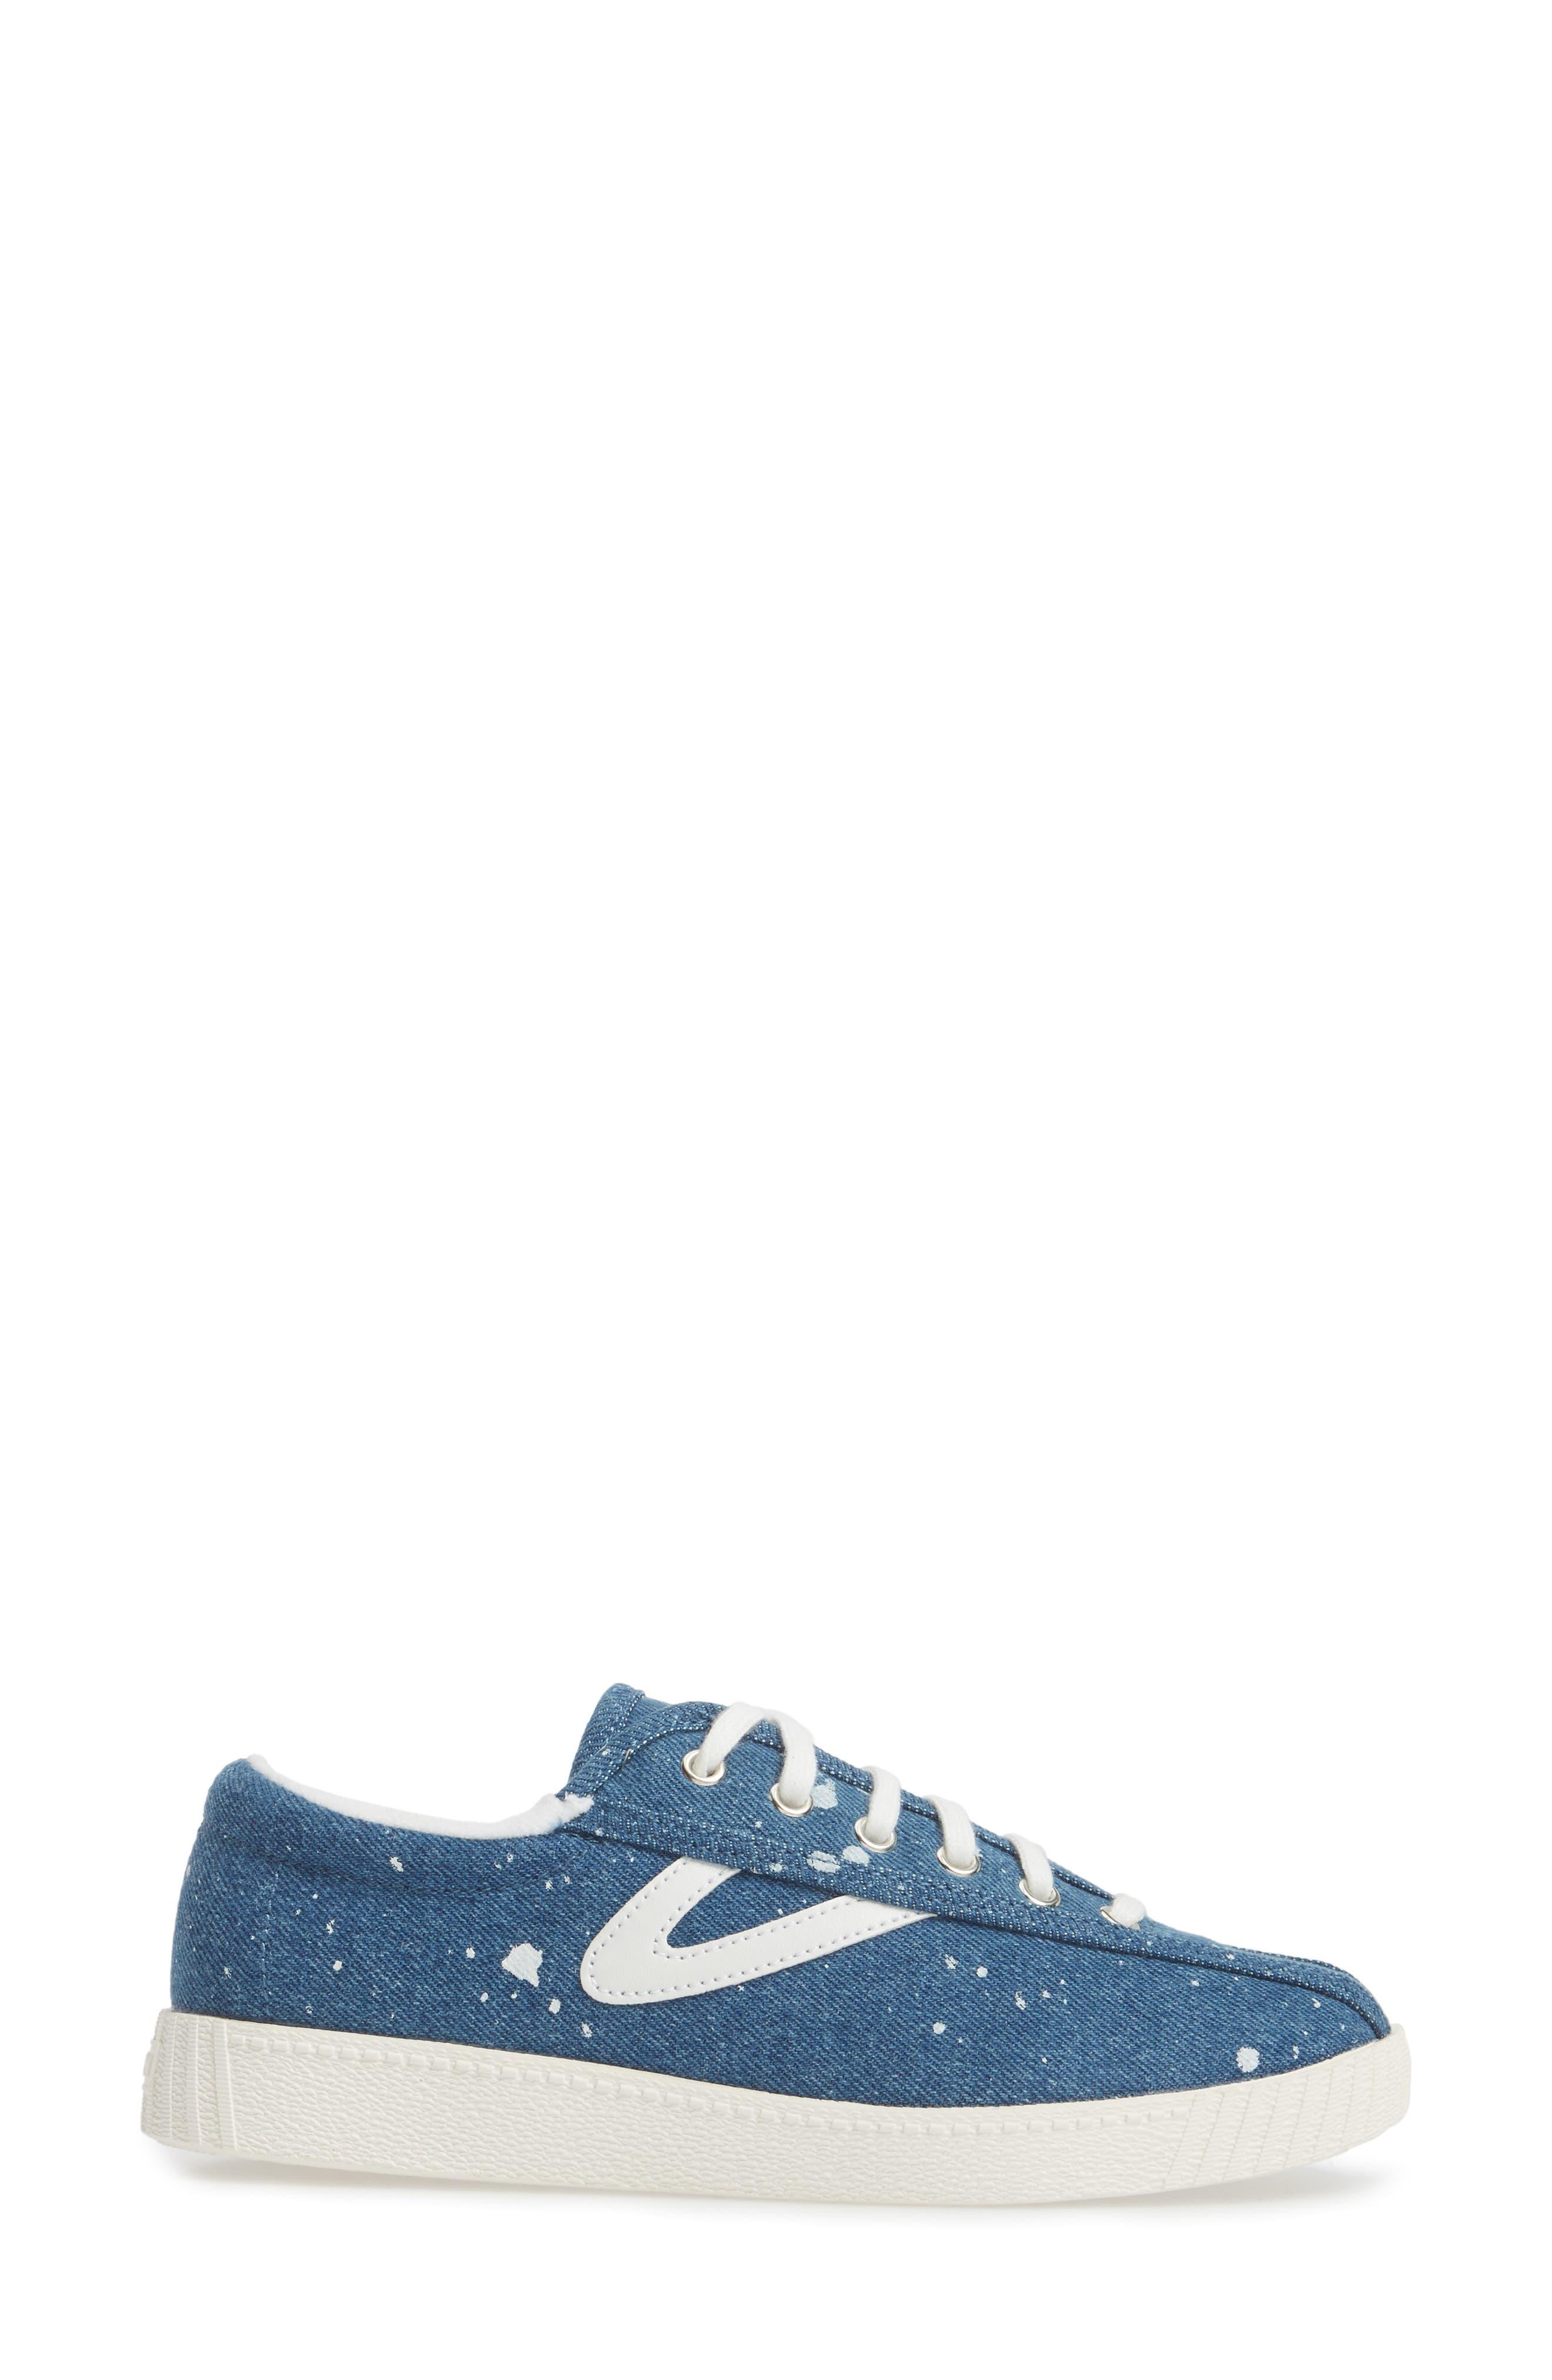 Nylite Plus Sneaker,                             Alternate thumbnail 3, color,                             Blue Fabric